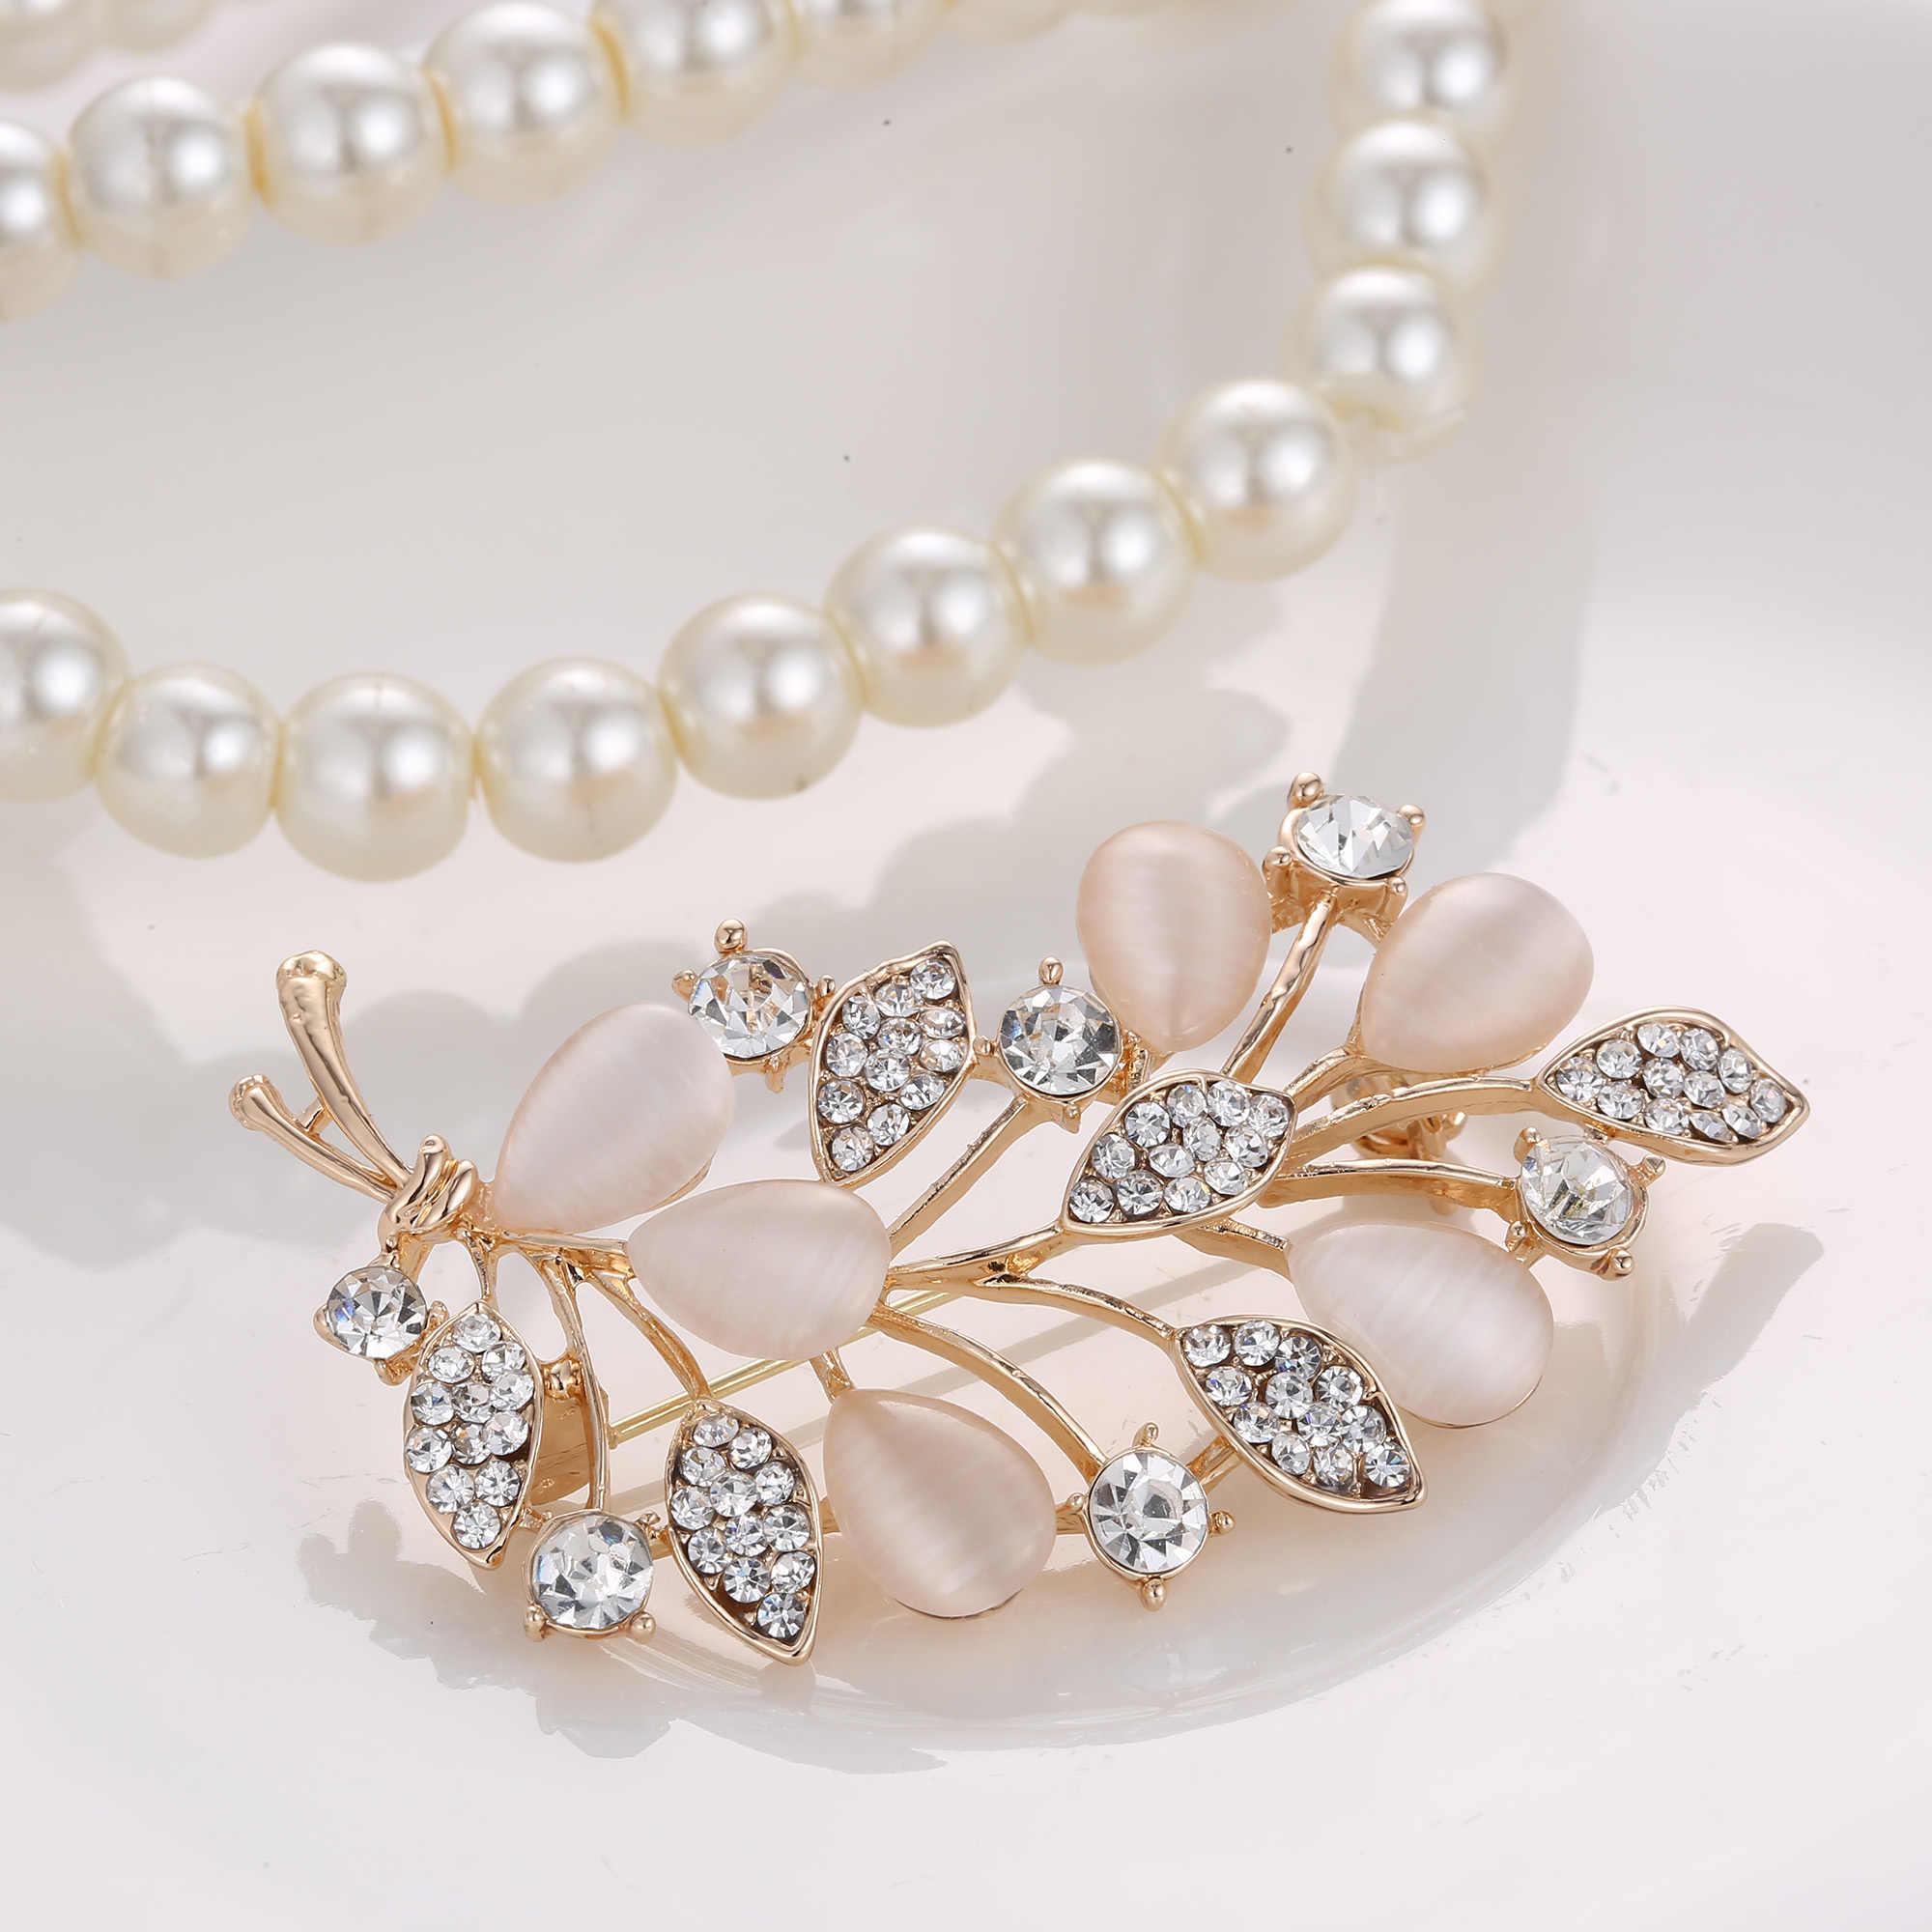 Rinhoo คริสตัล Rhinestone ดอกไม้เข็มกลัดสำหรับงานแต่งงานของผู้หญิงเสื้อผ้าอุปกรณ์เสริม Elegant Lady Casual เครื่องประดับ